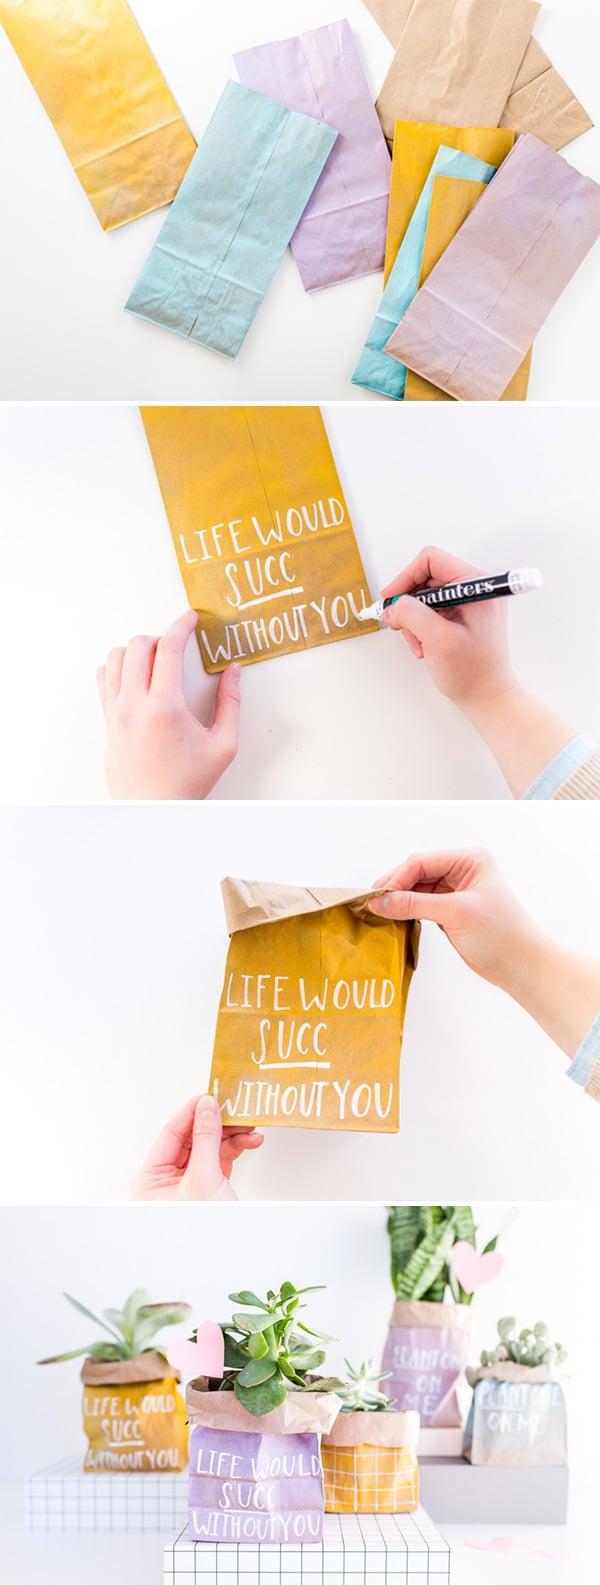 DIY Planted Paper Bag Valentines in 5 Minutes